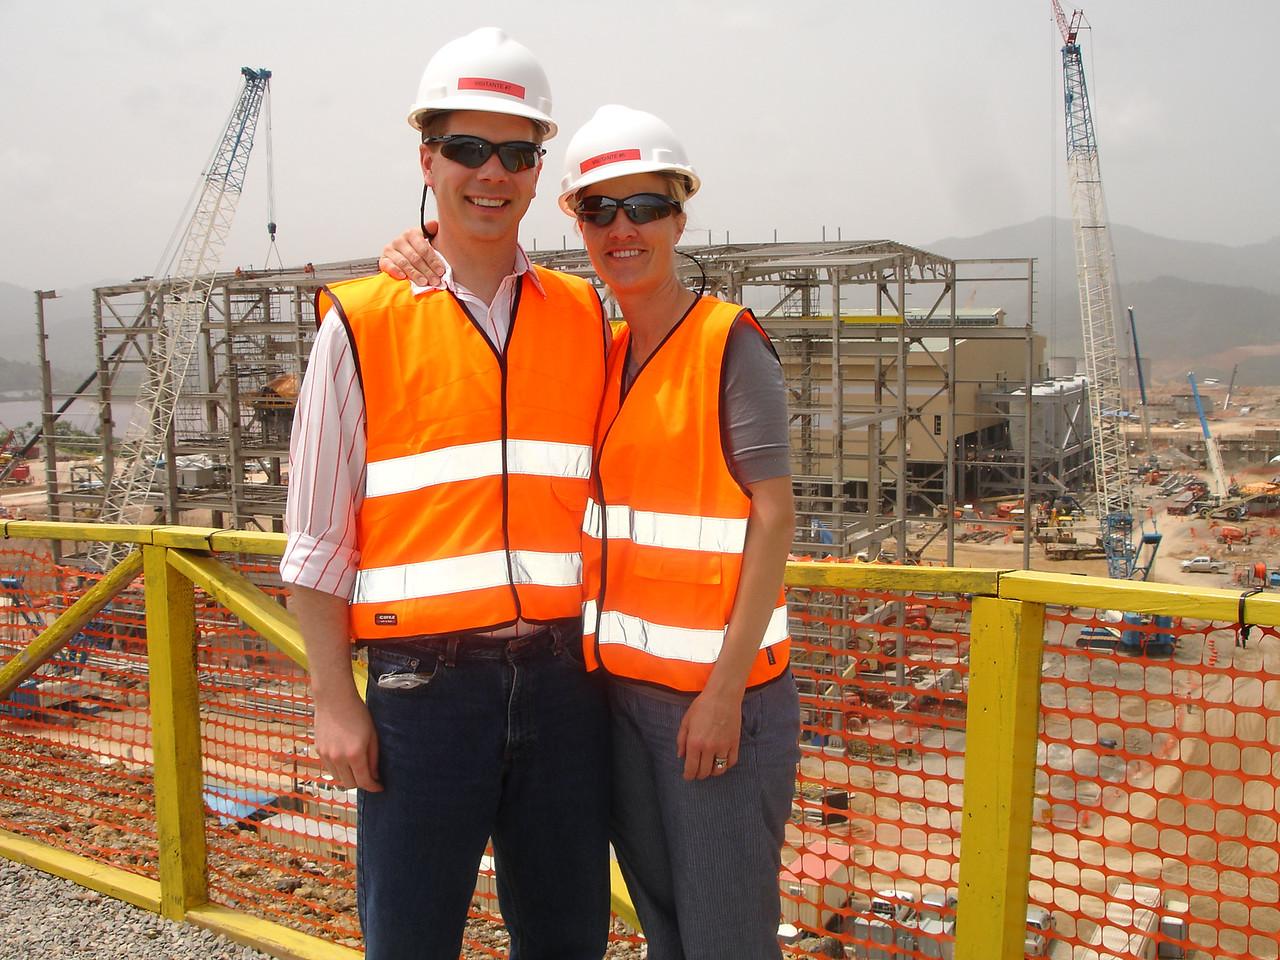 Scot and Lisa at Barrick PVDC, Dominican Republic